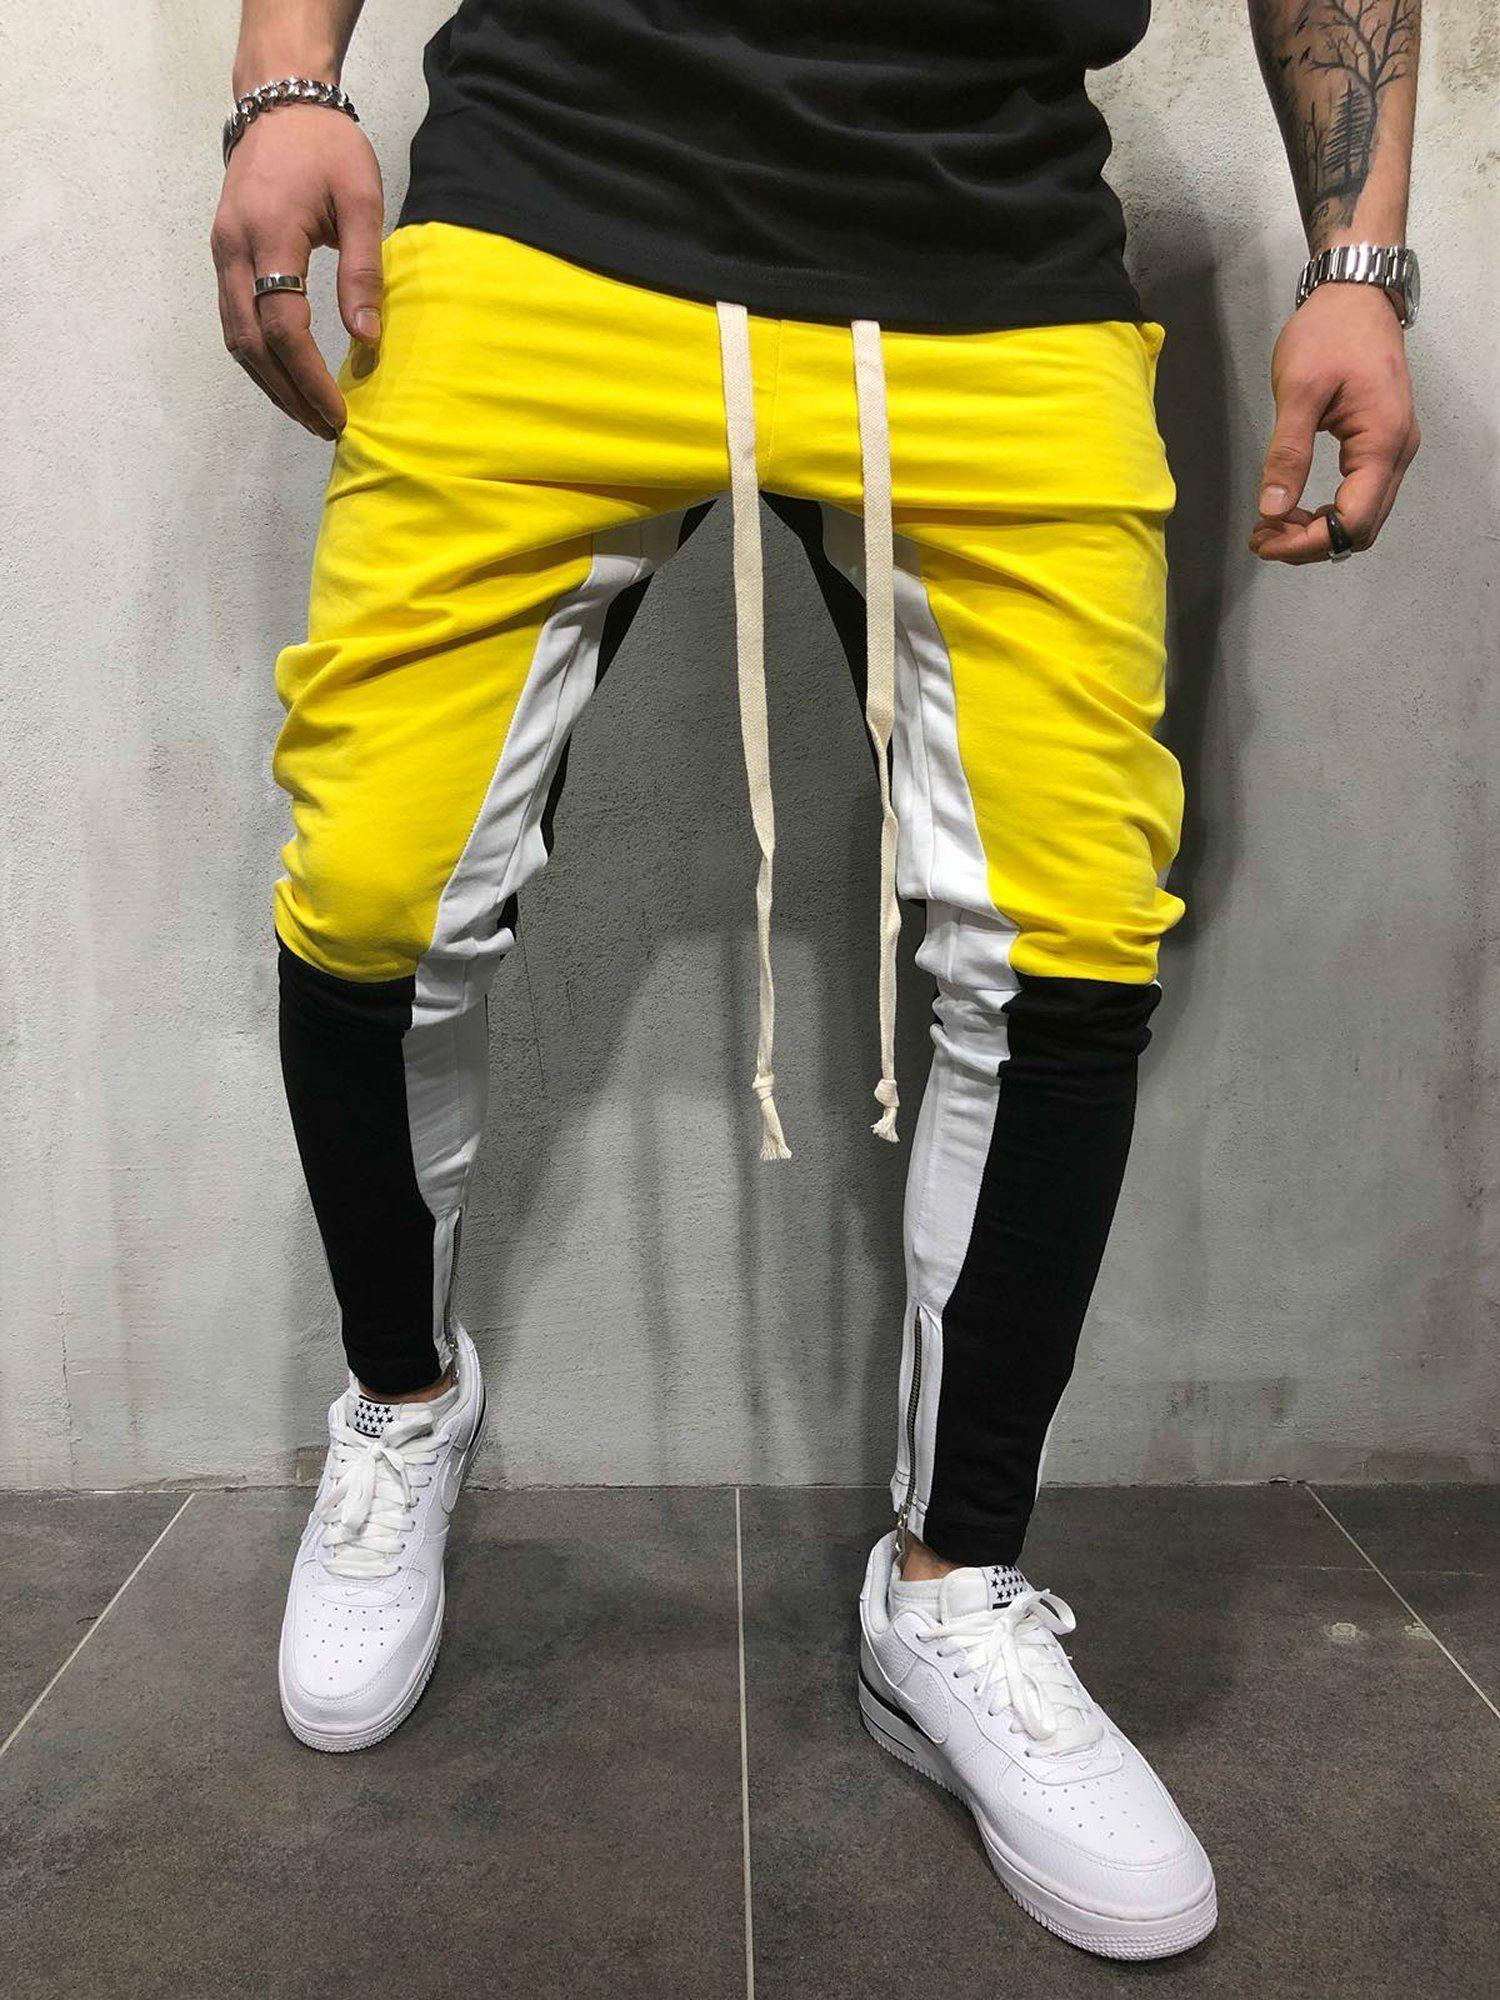 20b7fb99e5 Men Slim Fit Casual Tricolor Sweatpants Joggers - Yellow 3710 ...